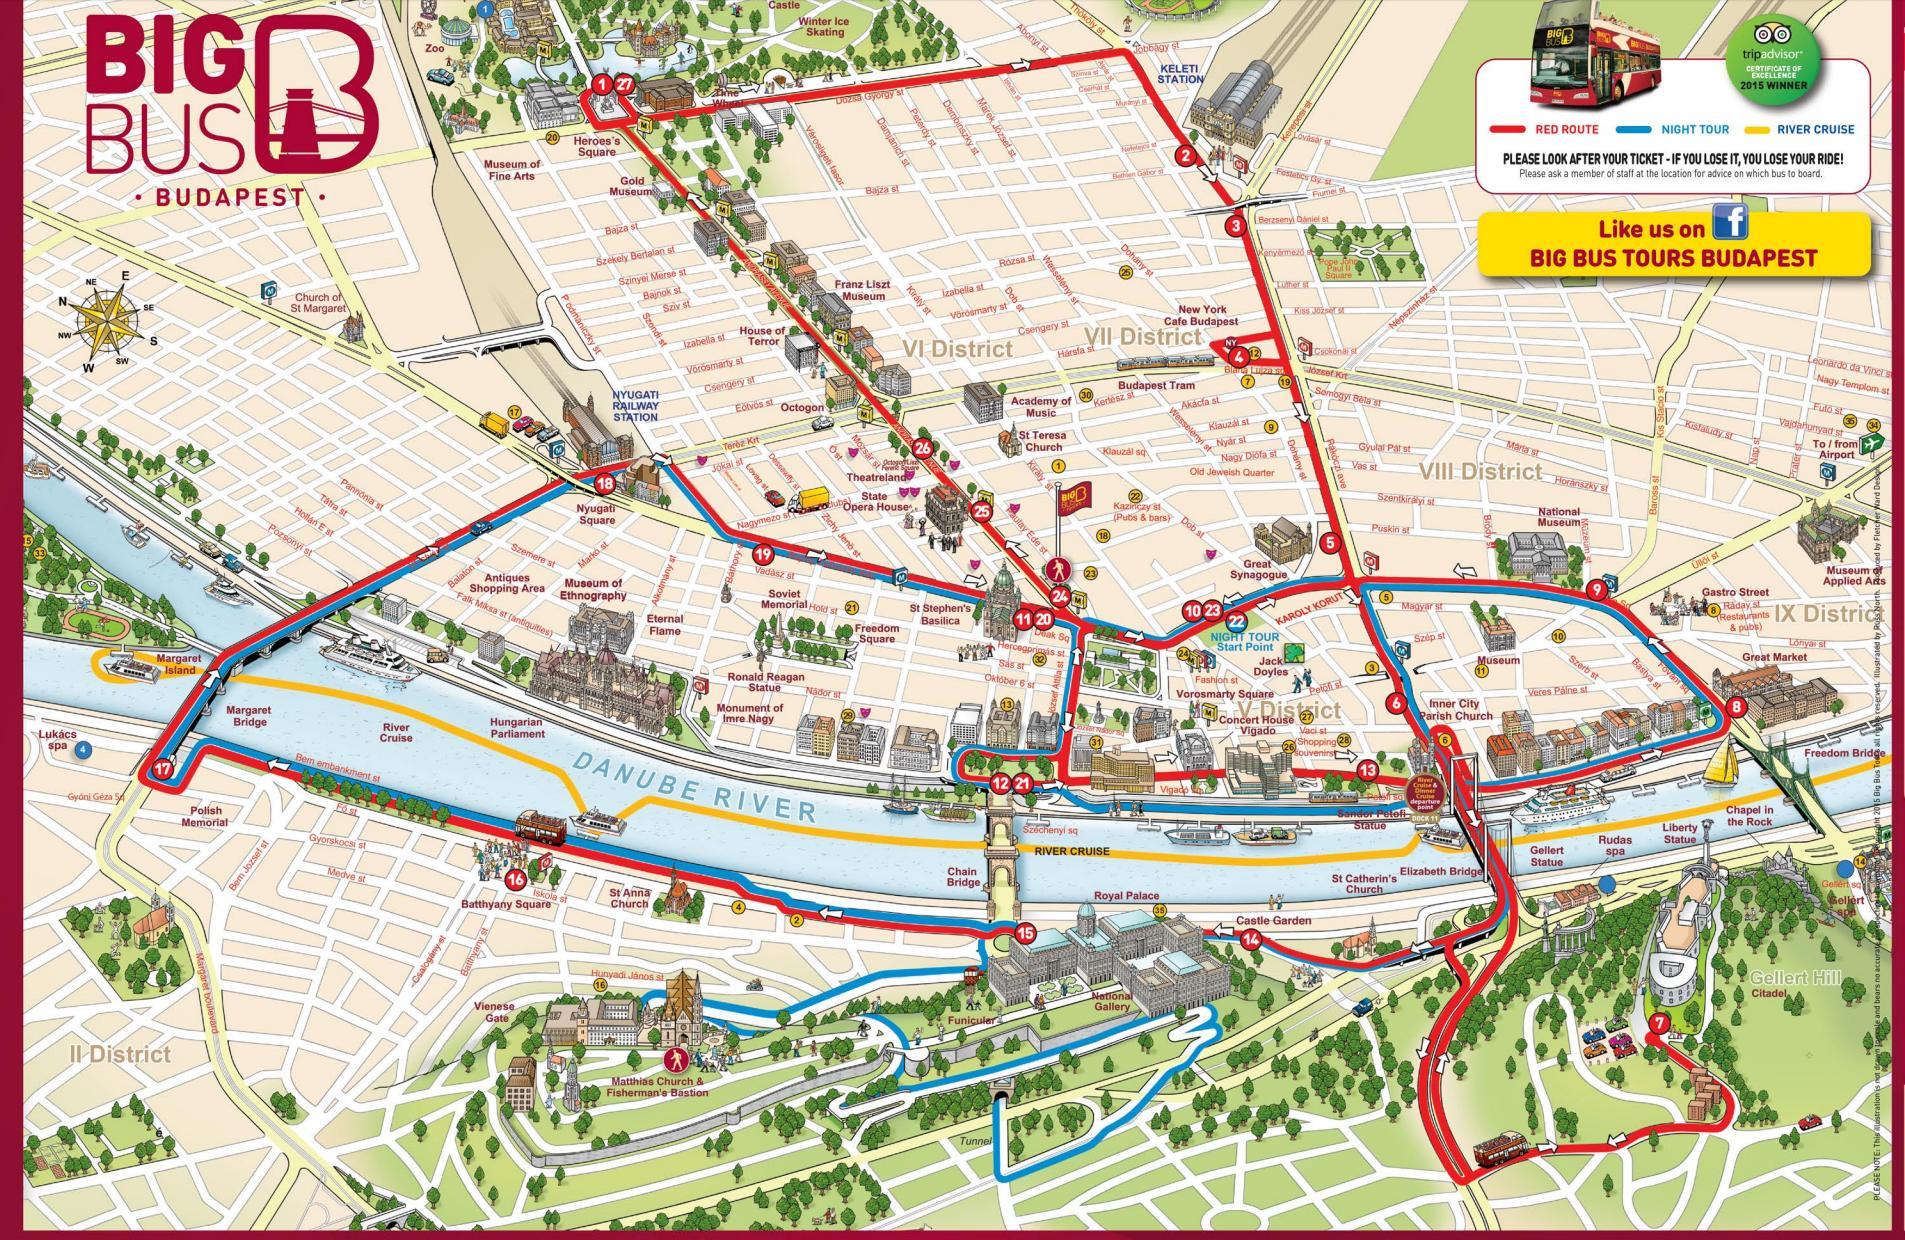 Big Bus Tour New York City Map Nemetas Aufgegabelt Info